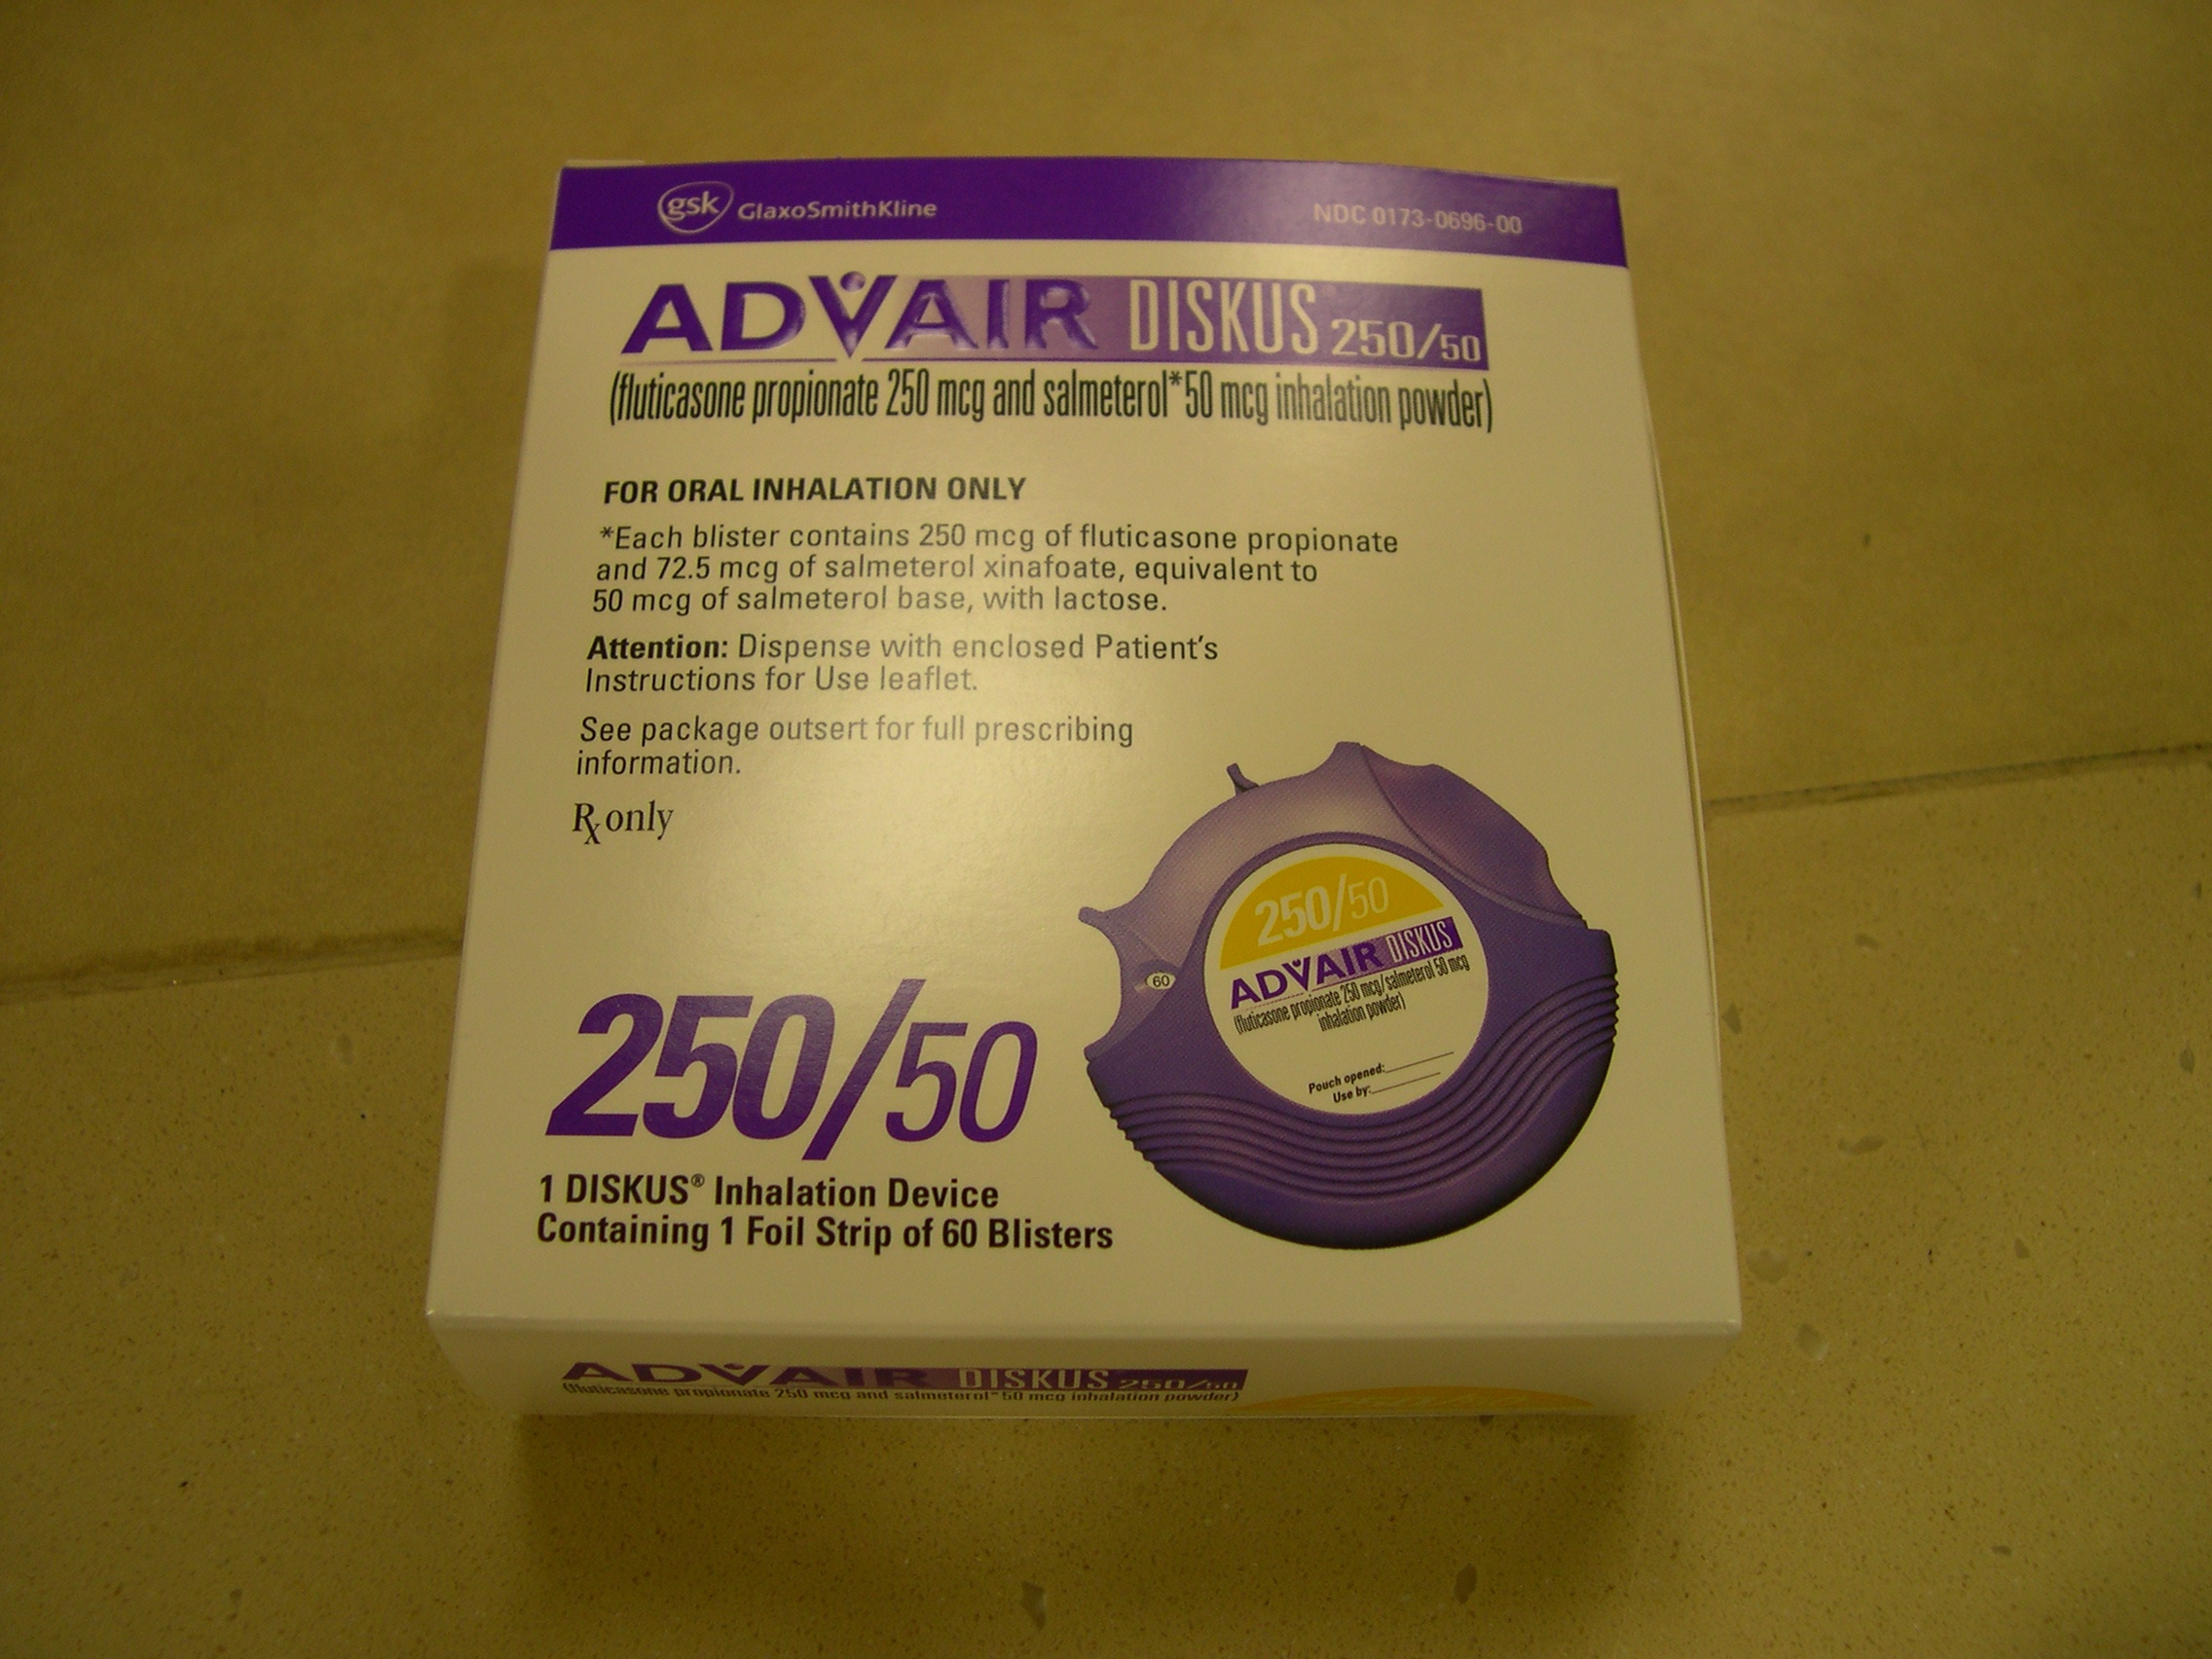 Flovent Coupon / Active Deals - Free Advair Coupon Printable